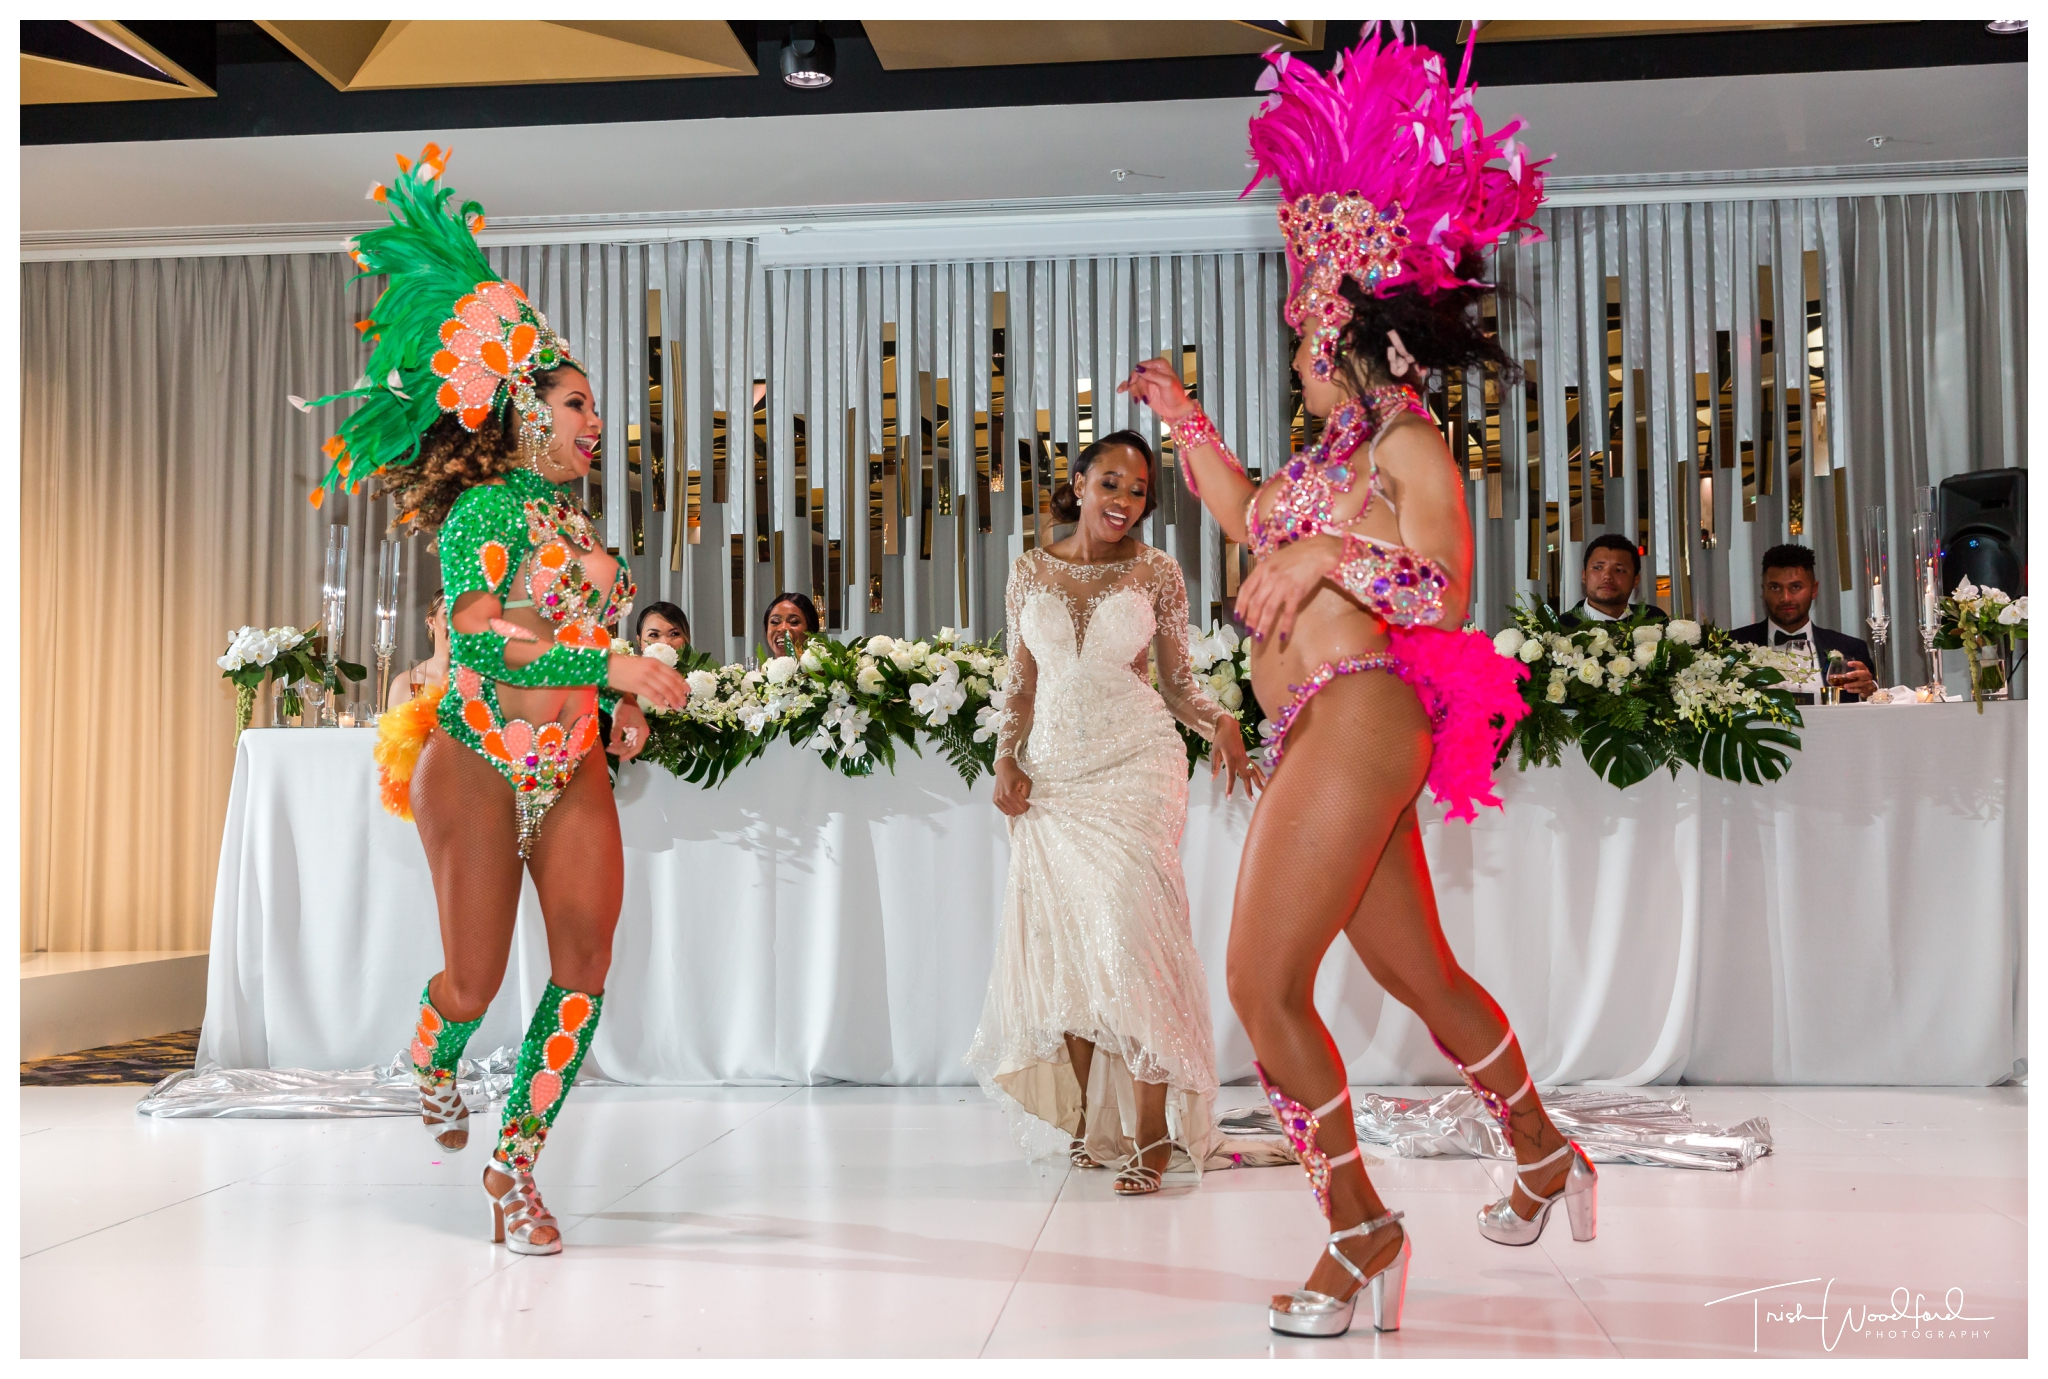 Sambrazil Dancers Perth Wedding